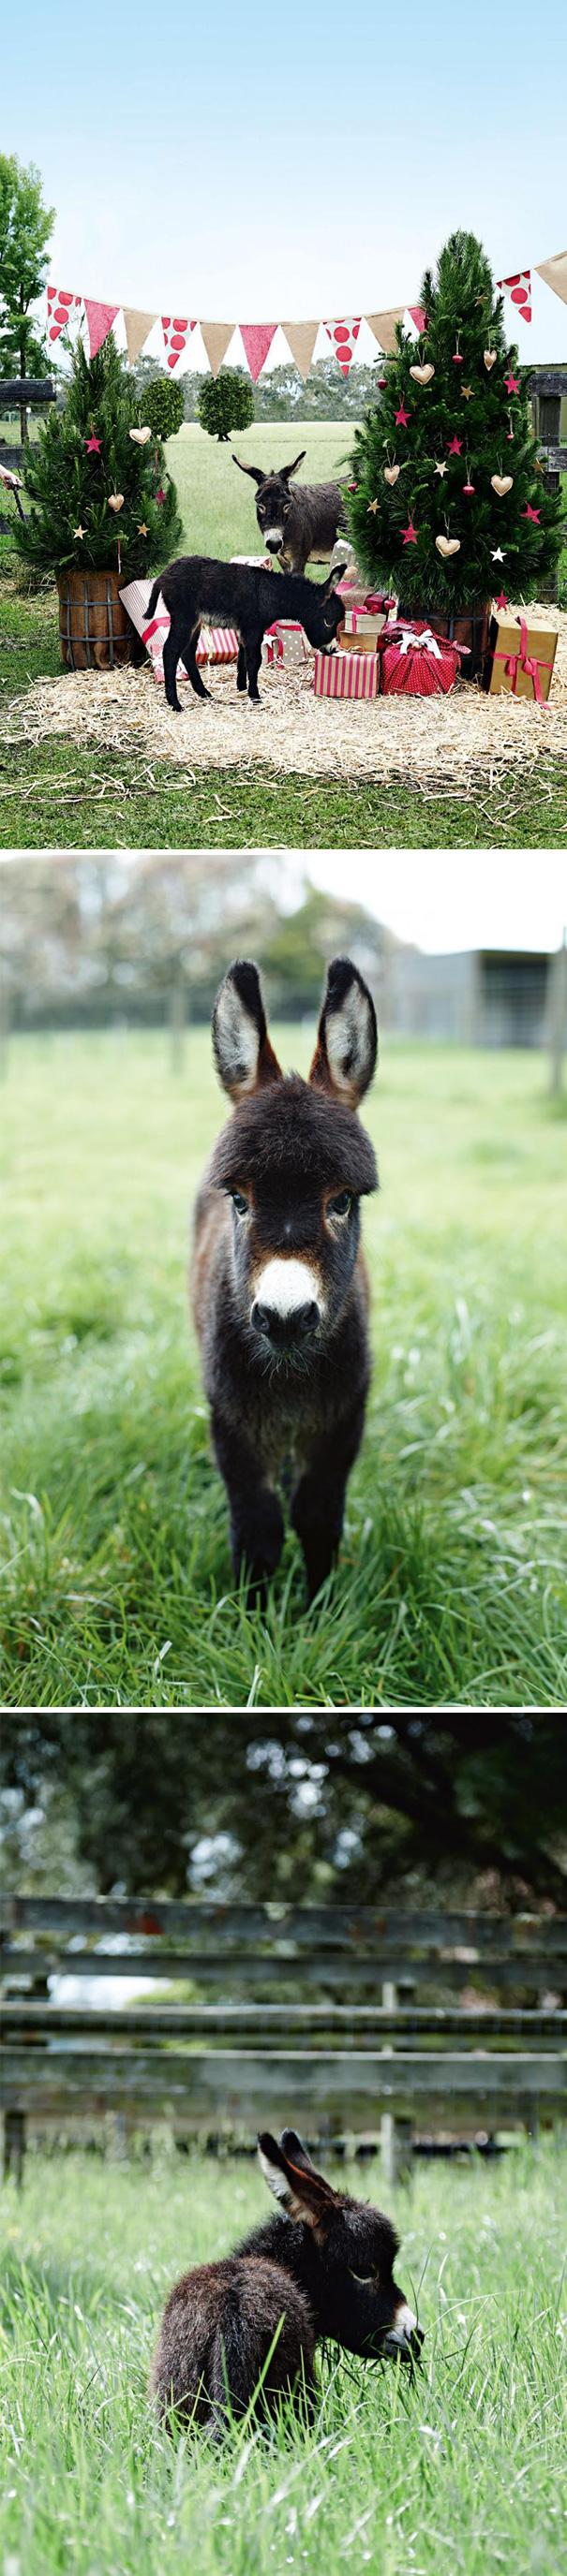 Celebrating Christmas On A Miniature Donkey Farm